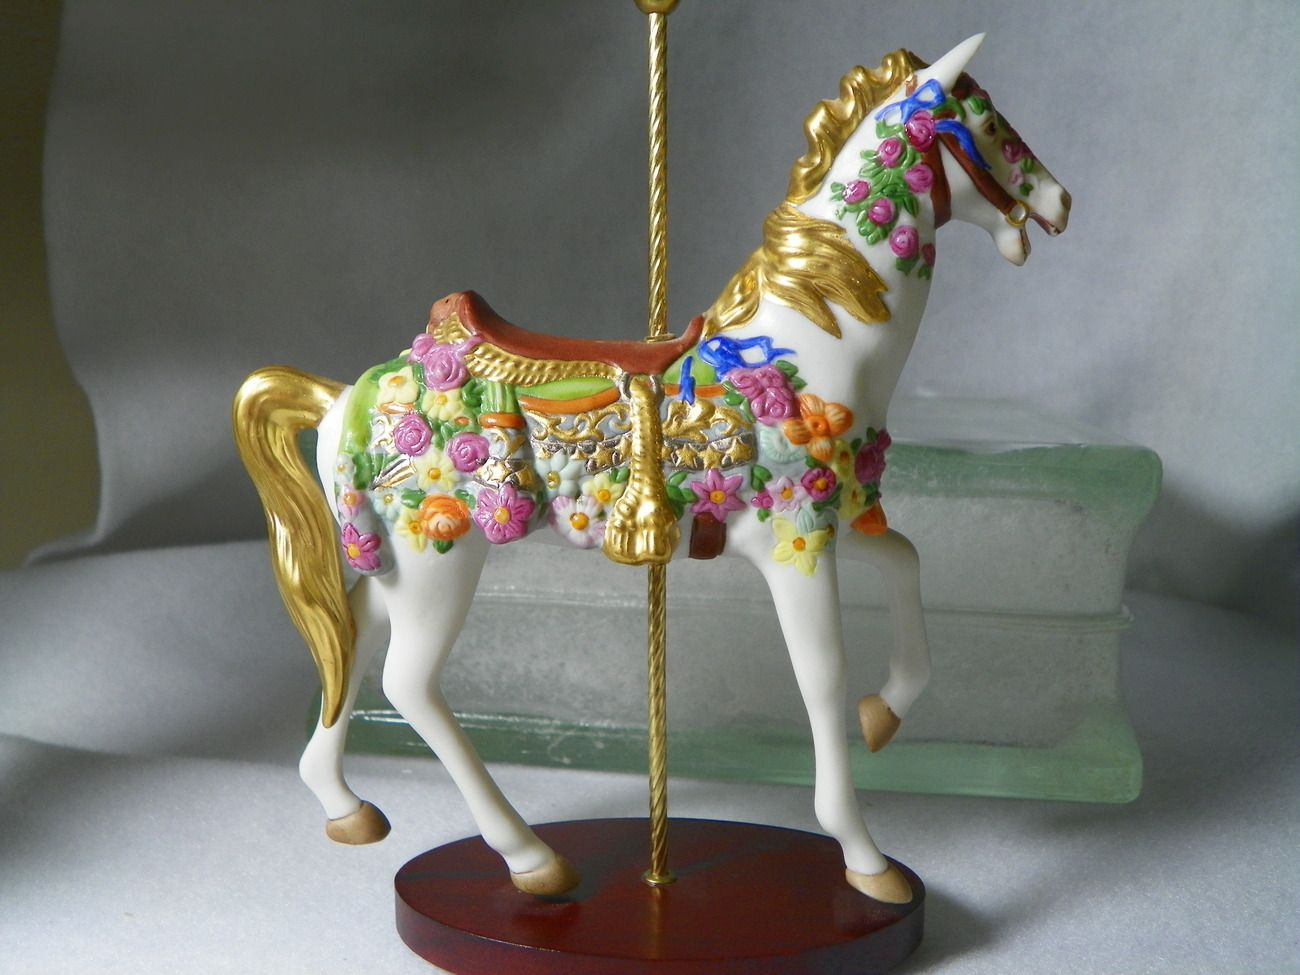 1988 Franklin Mint American Beauty Carousel Horse